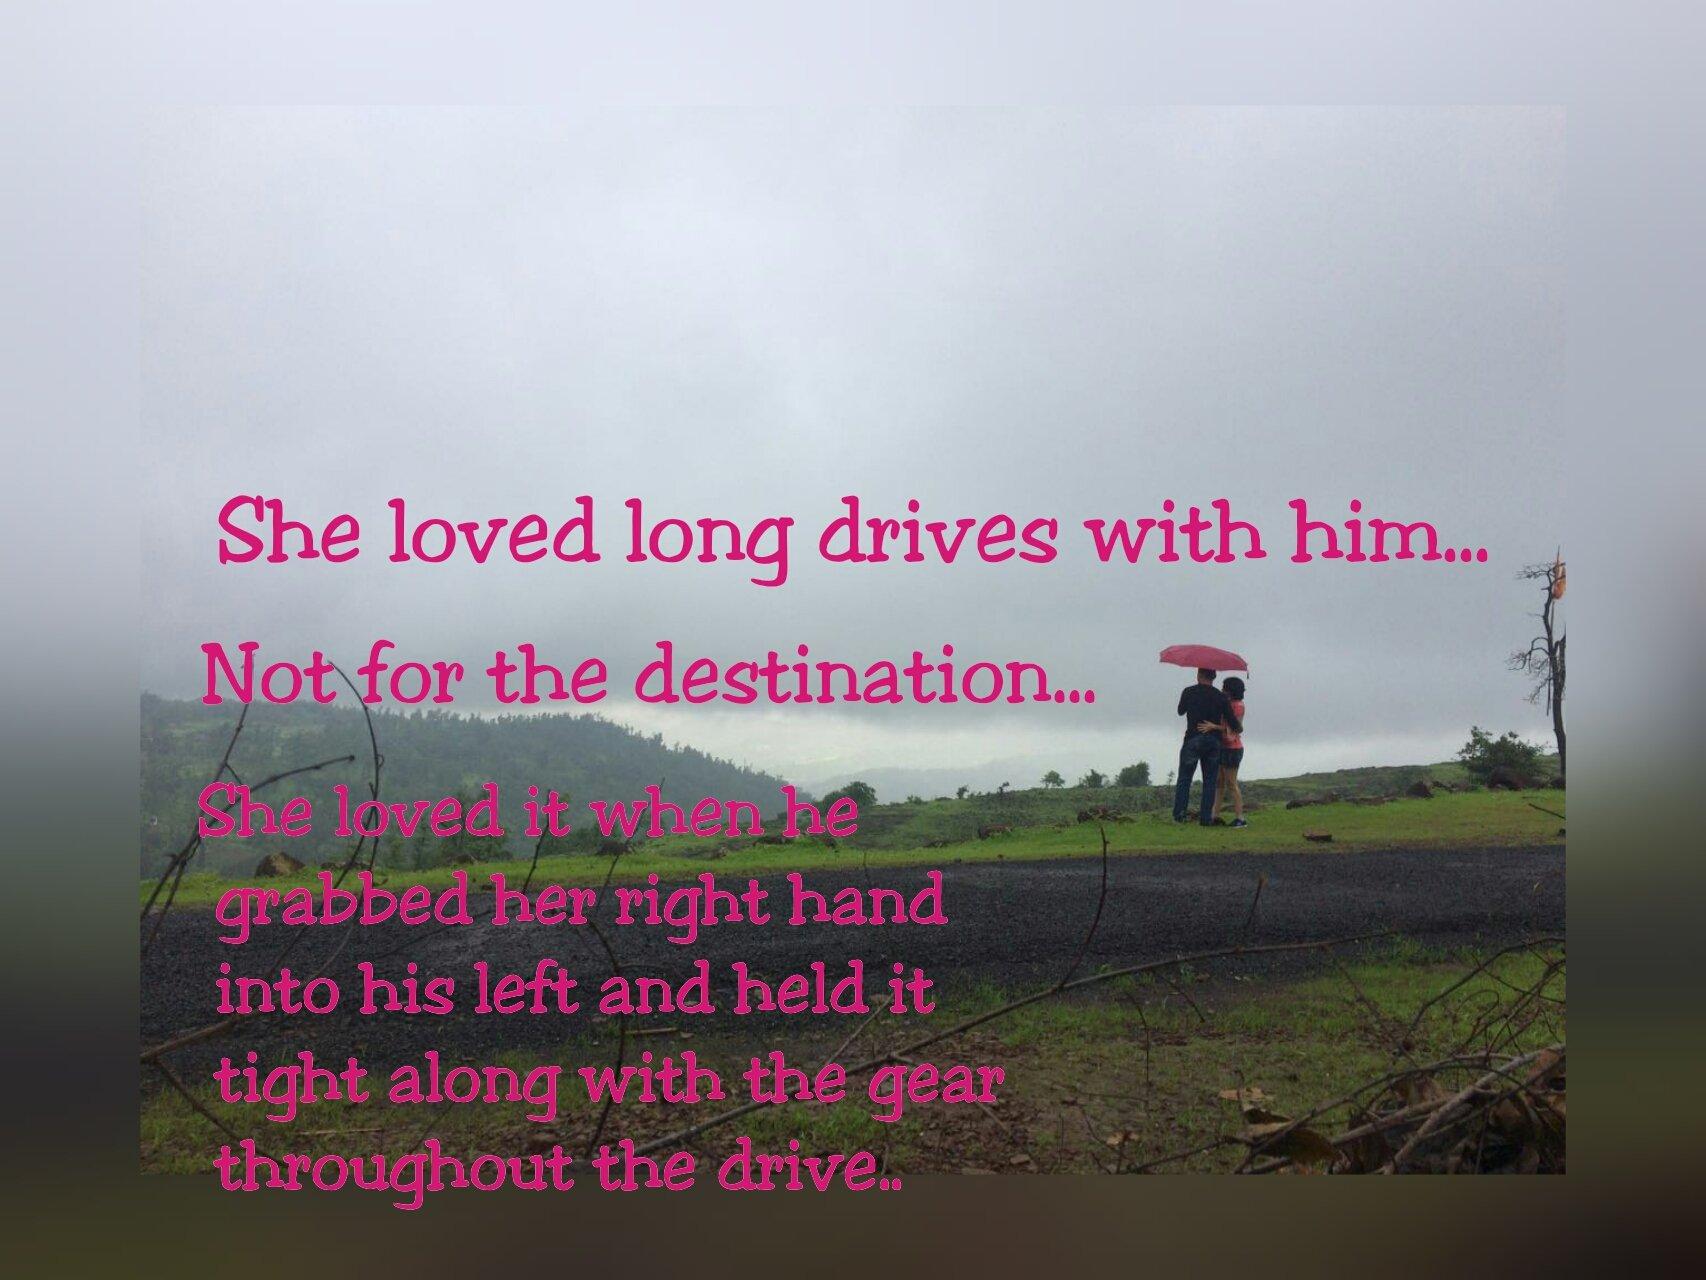 #TGIFTF #Tiniature #FridayFeeling #travel #love ..yes that's Ann n Raa :) @gayatri_gadre https://t.co/JQV3wd0HF3